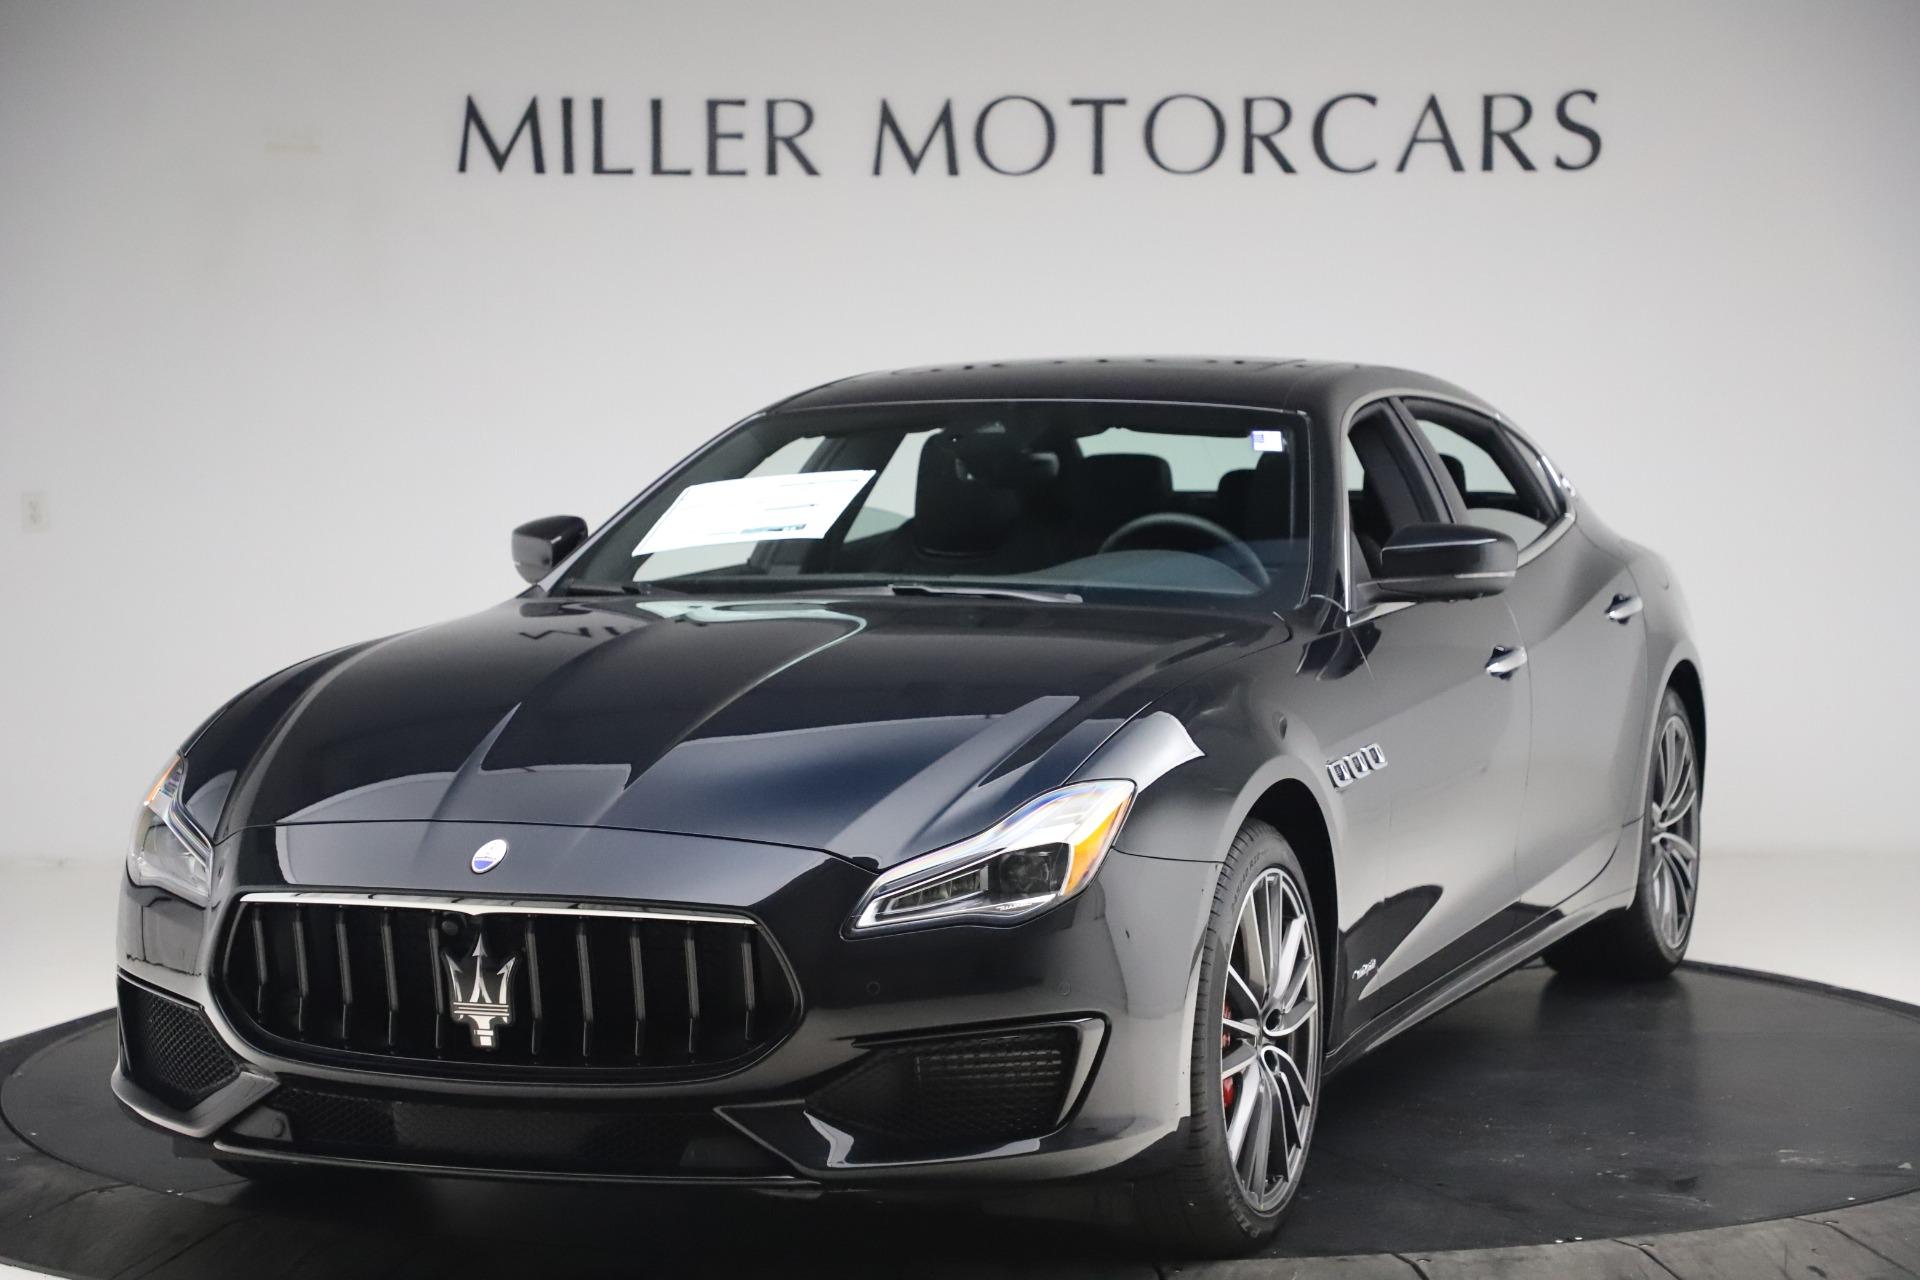 New 2021 Maserati Quattroporte S Q4 GranSport for sale $129,185 at McLaren Greenwich in Greenwich CT 06830 1